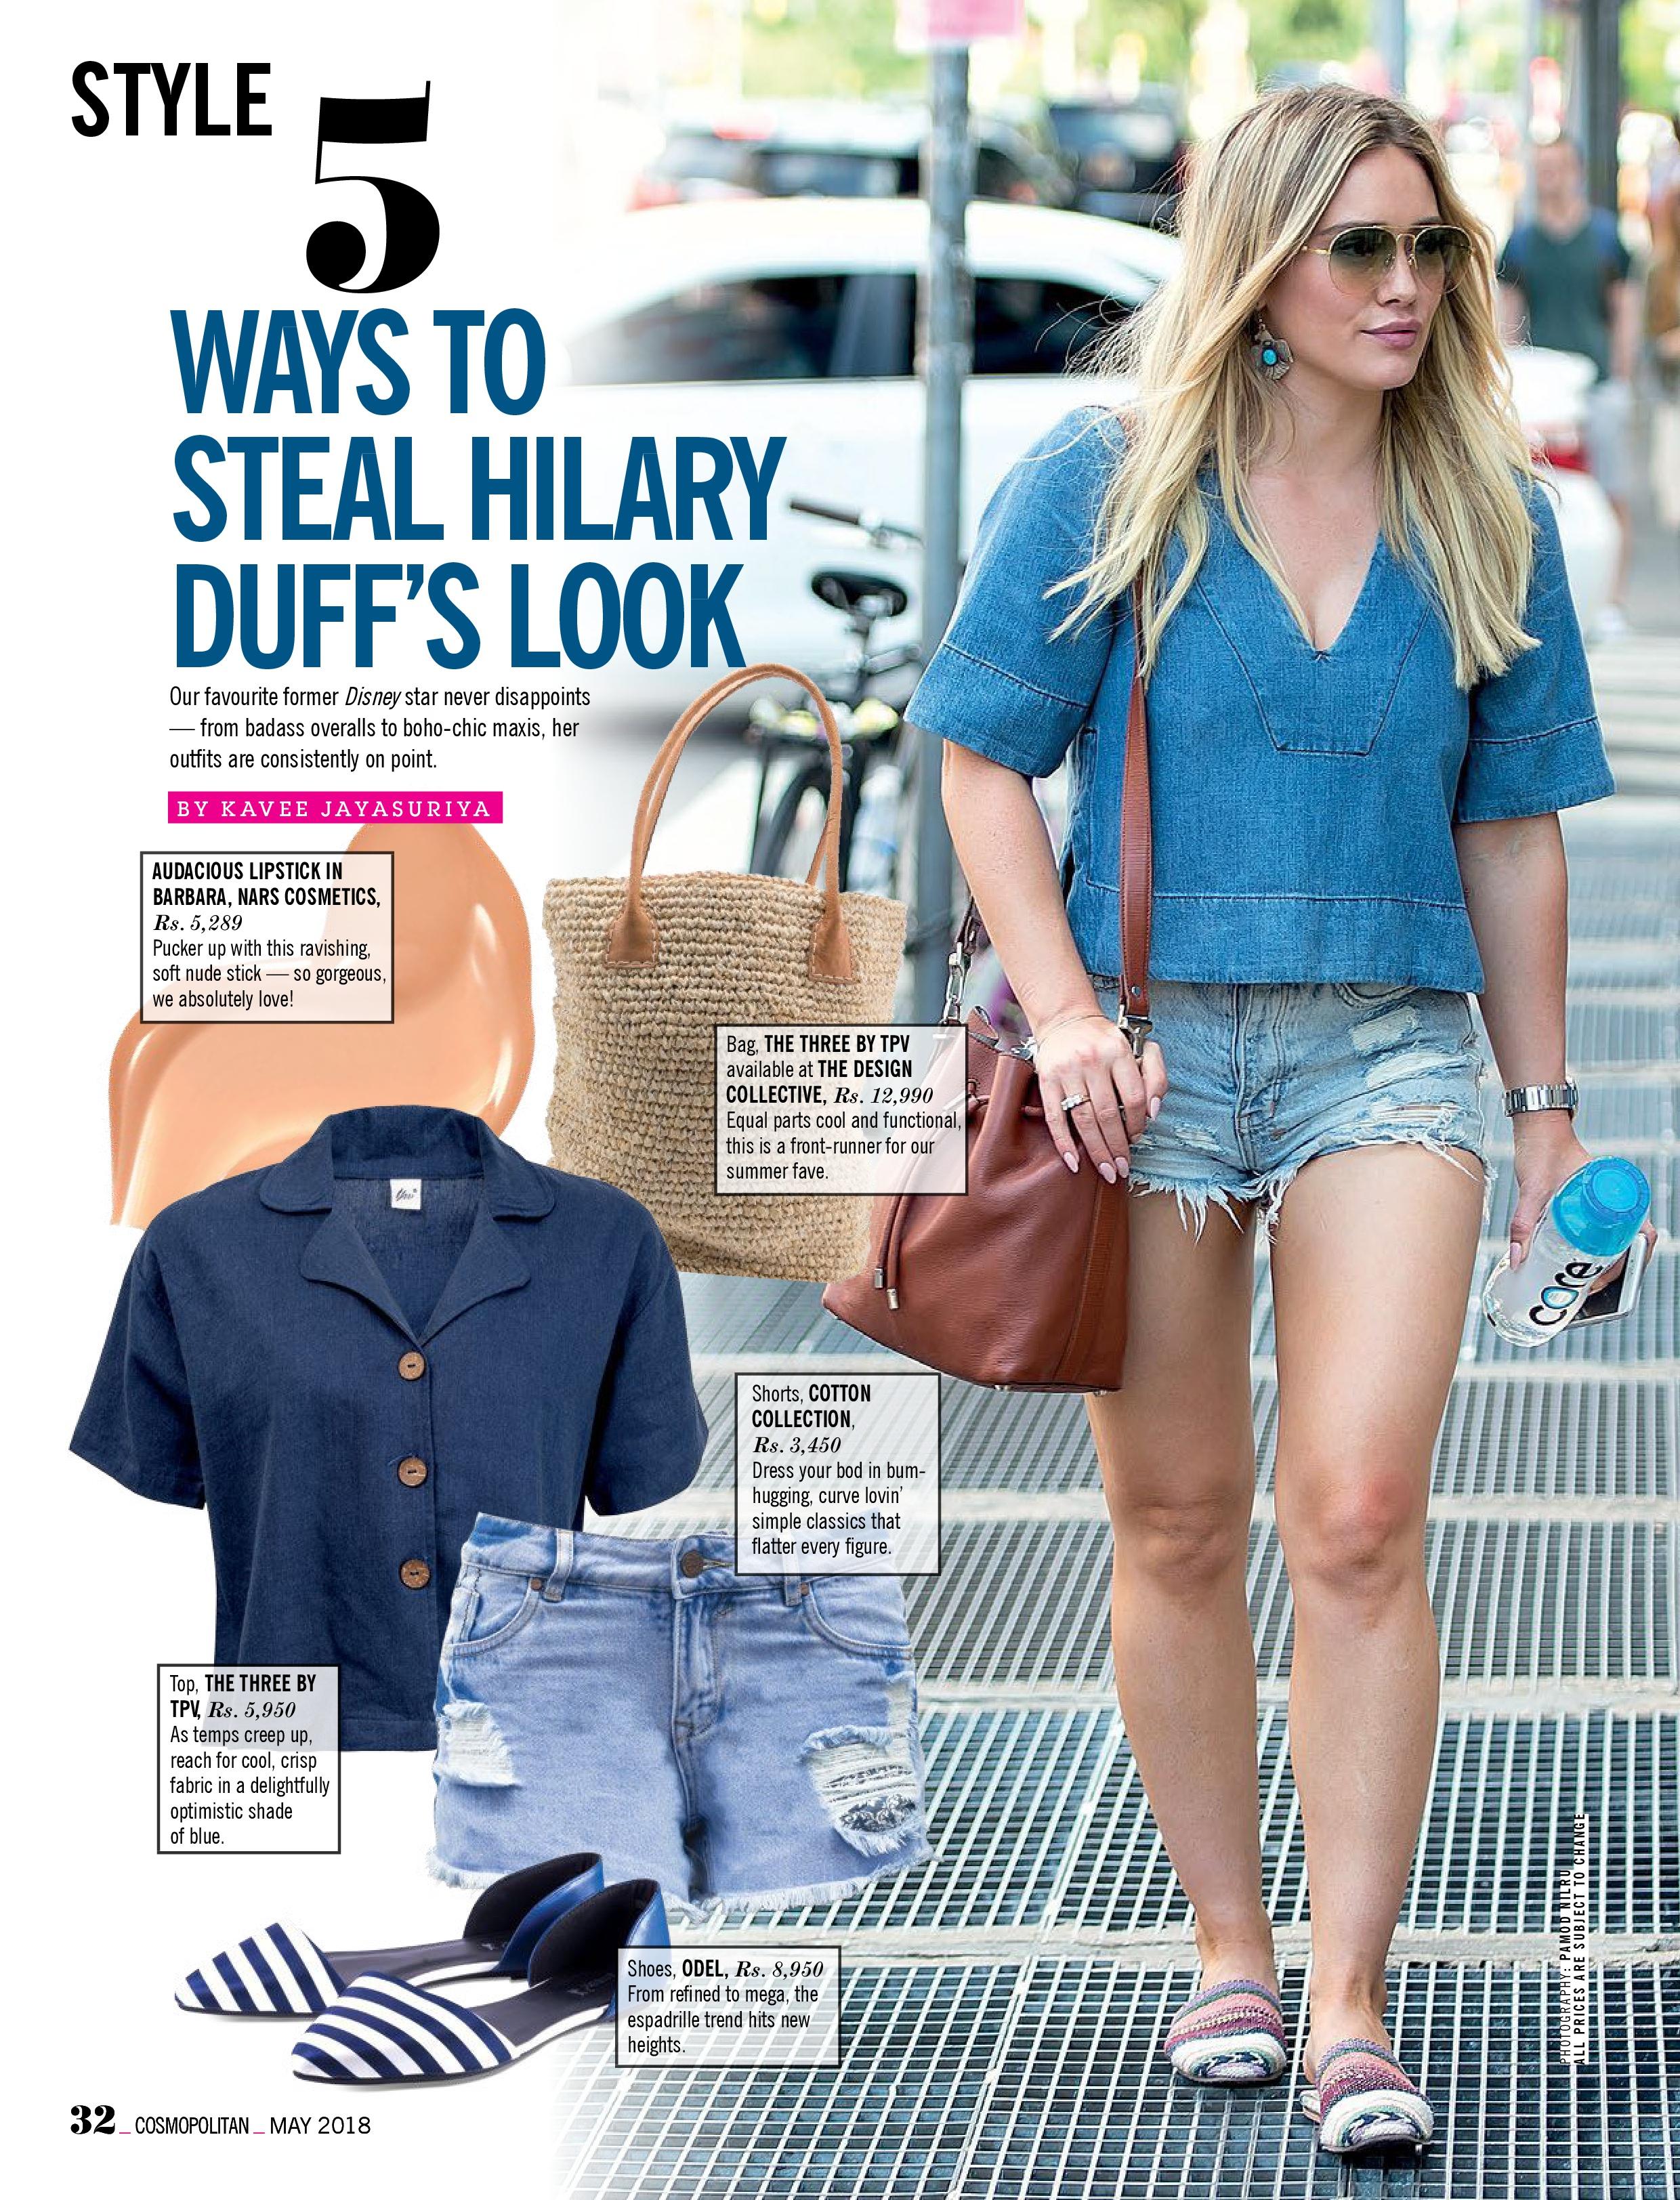 Hilary Duff for Cosmopolitan Sri Lanka (May 2018)